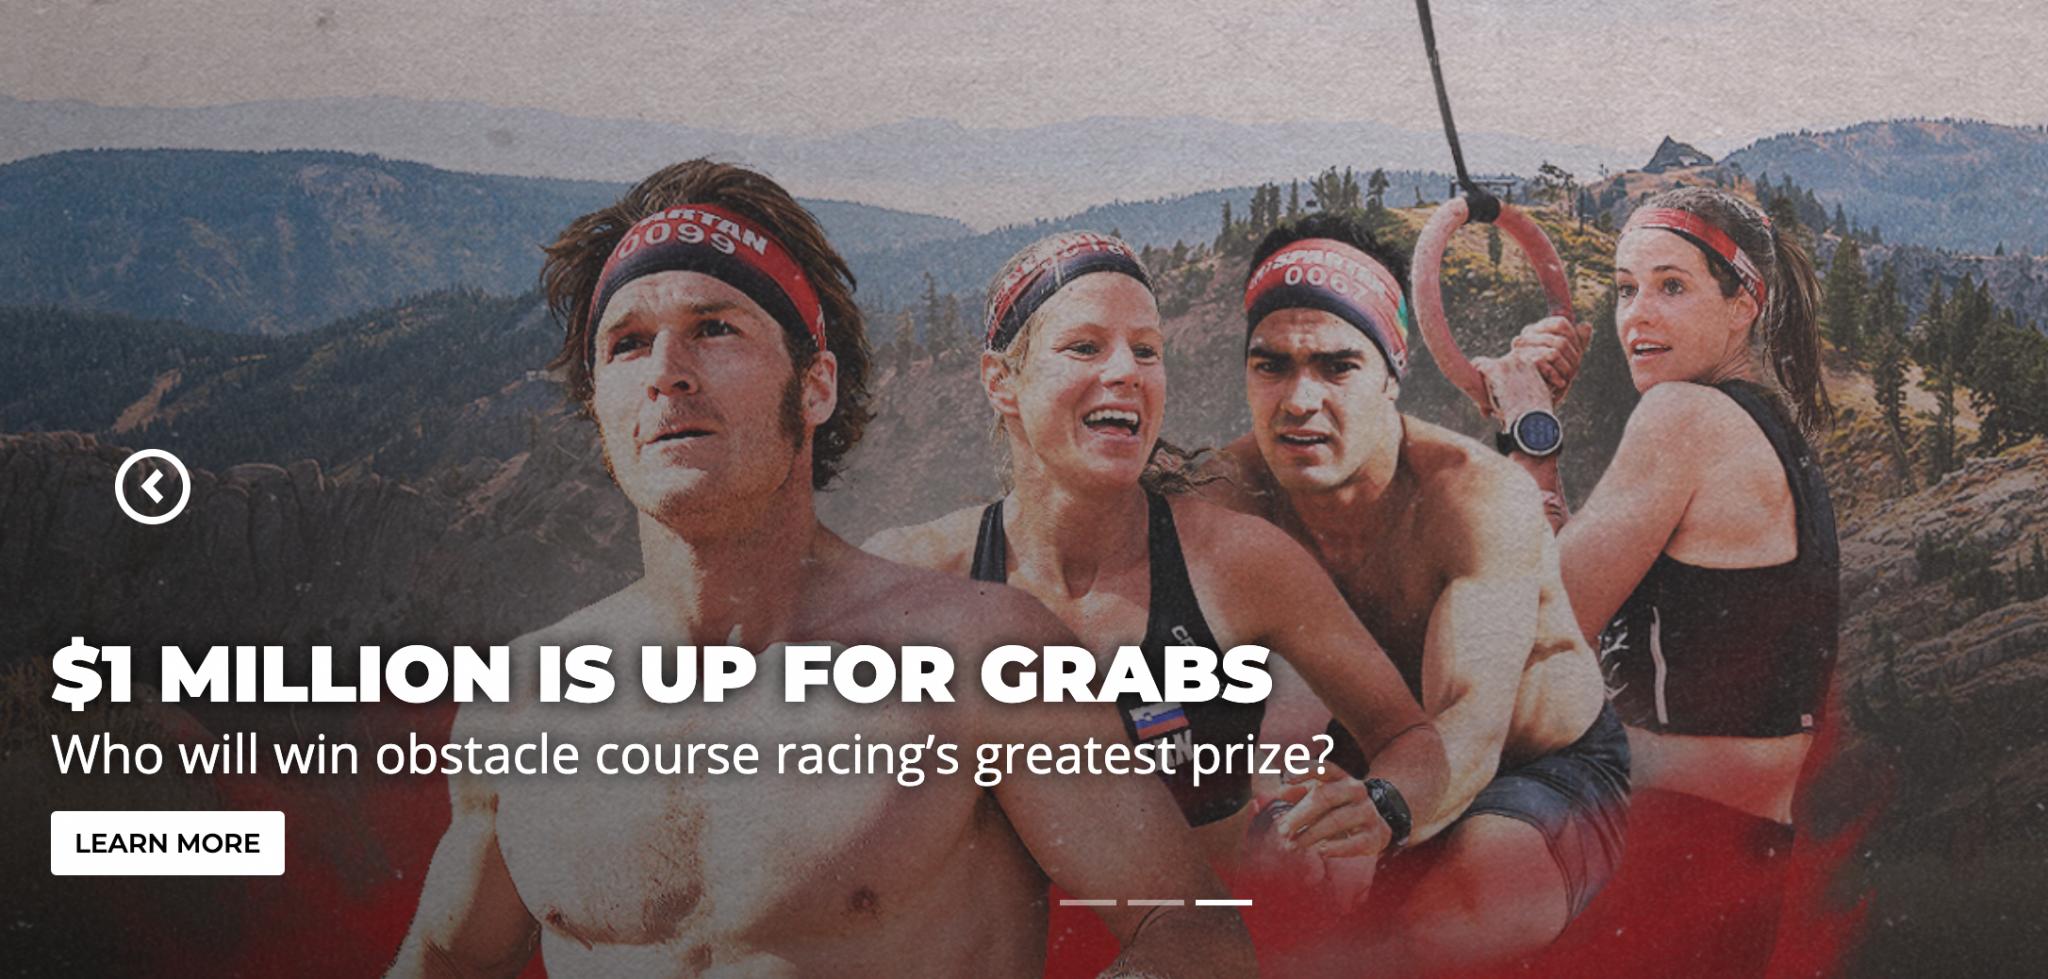 Spartan Race 1 Million Dollar Purse